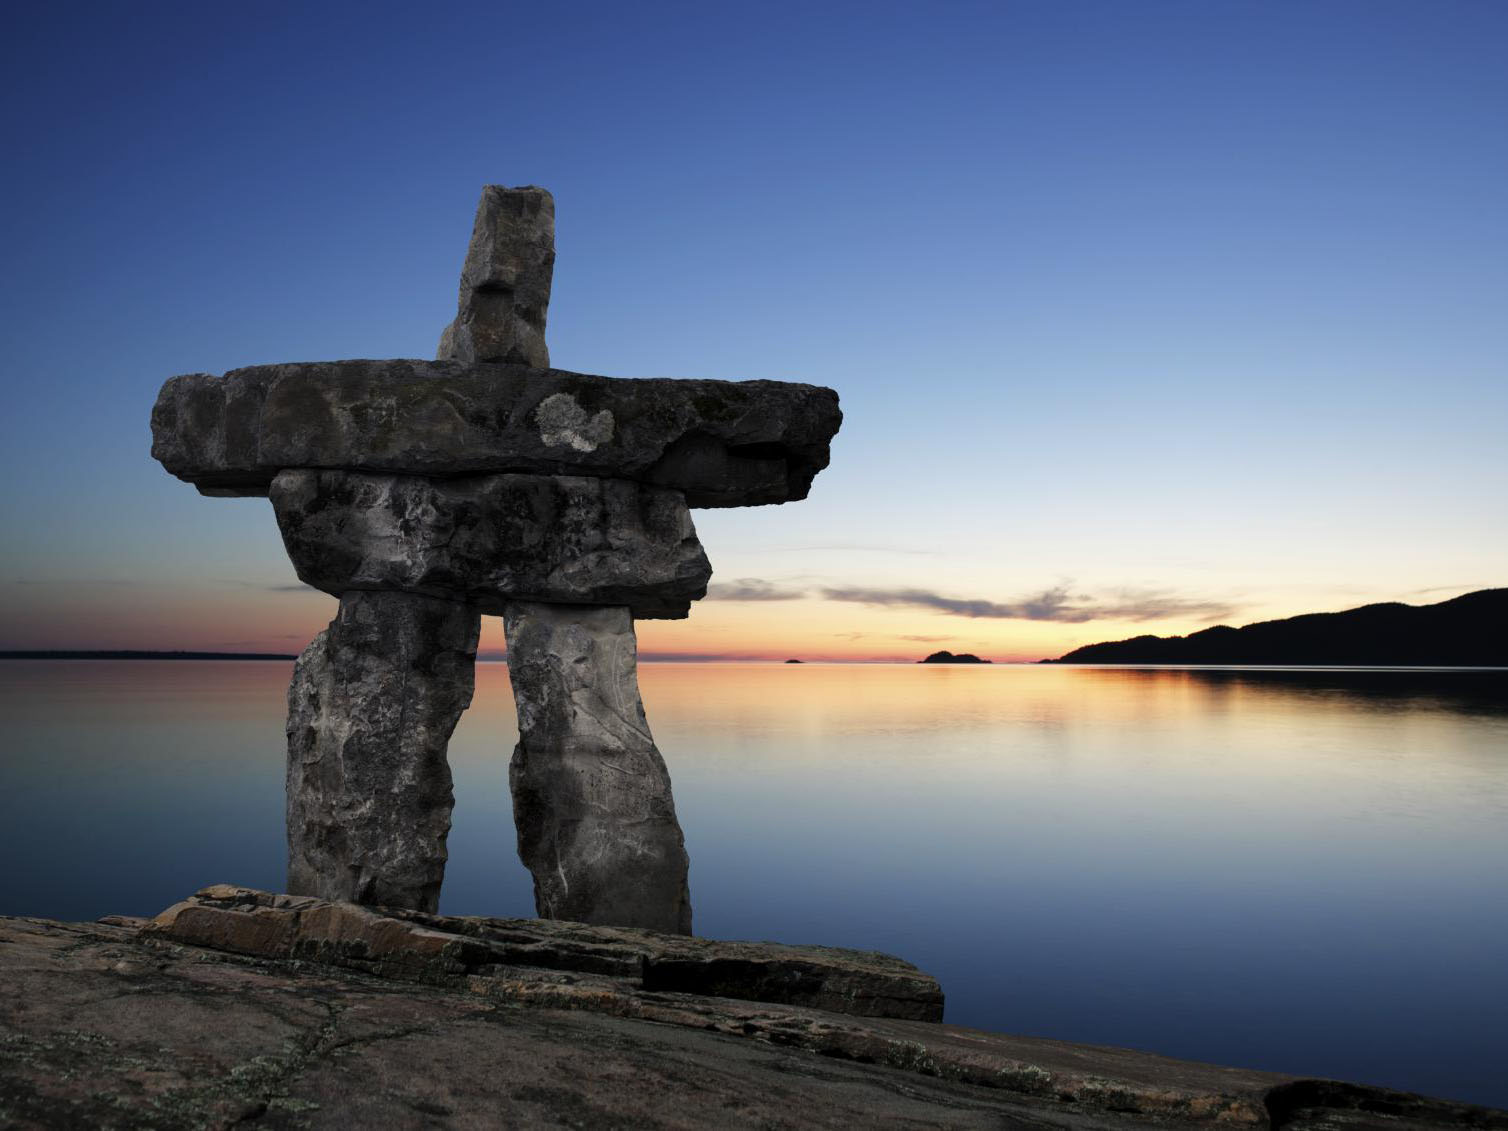 inuit culture and legends scholastic